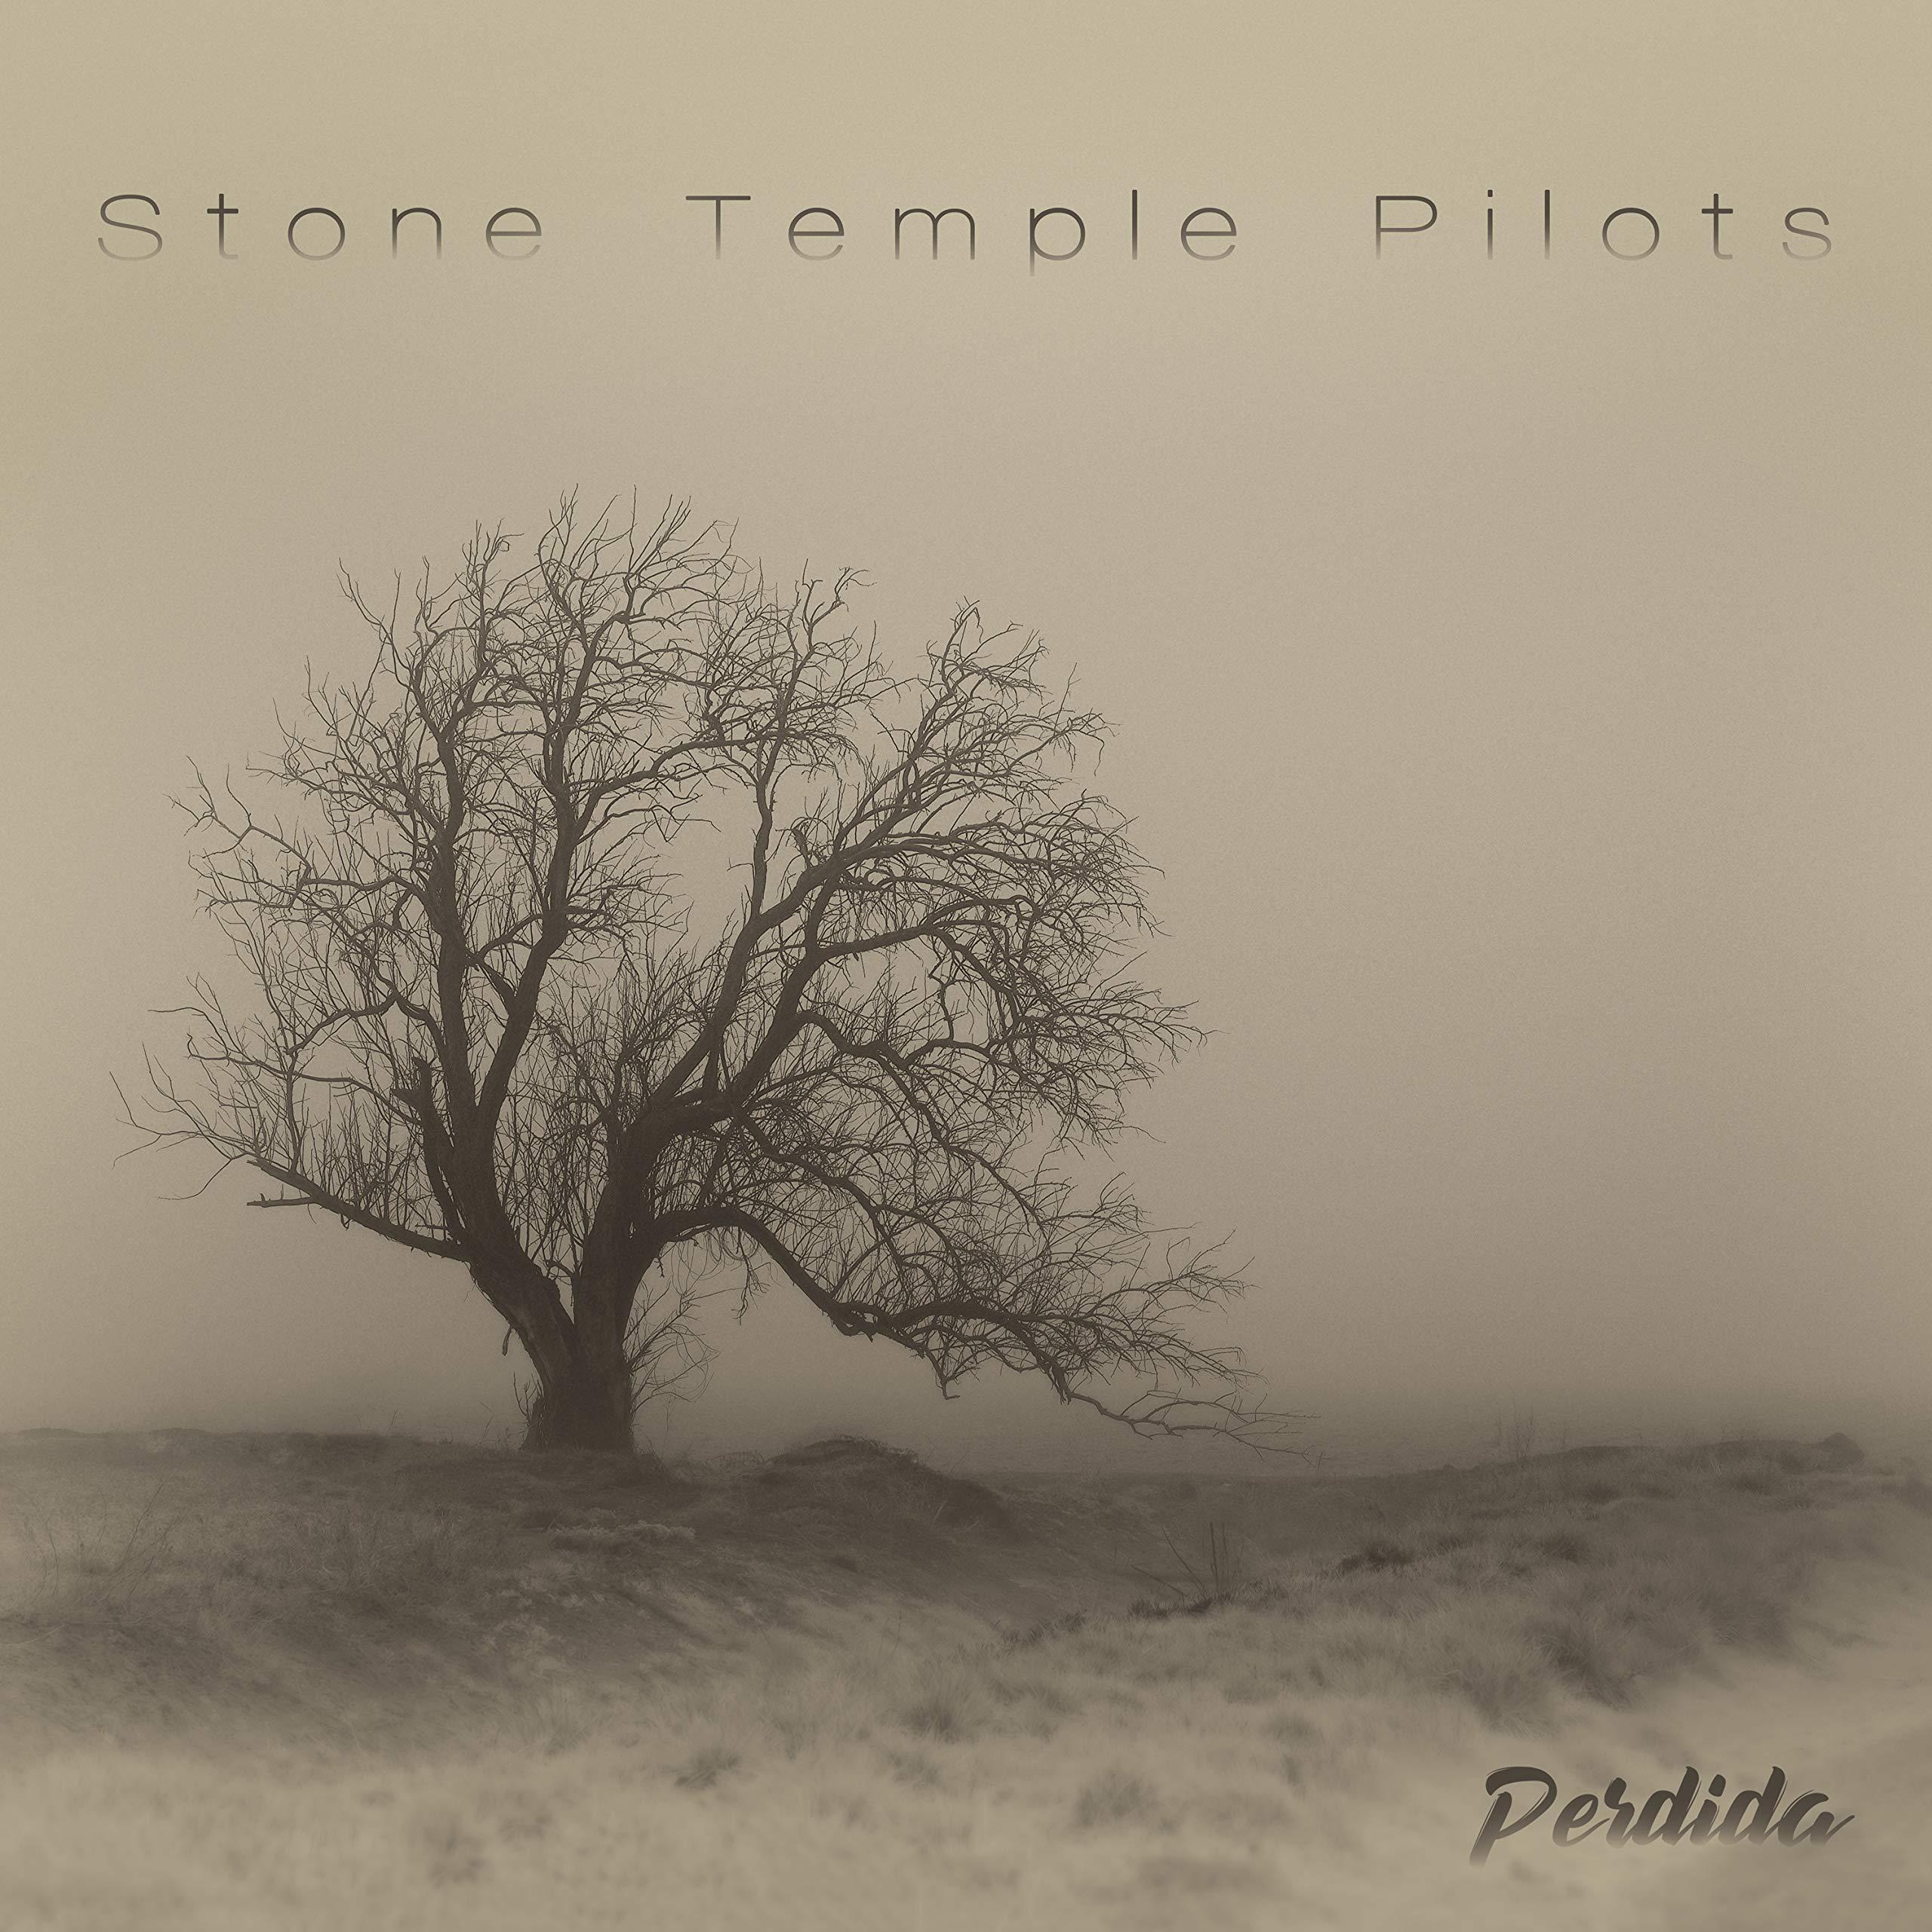 Stone Temple Pilots – Perdida (2020) [FLAC]